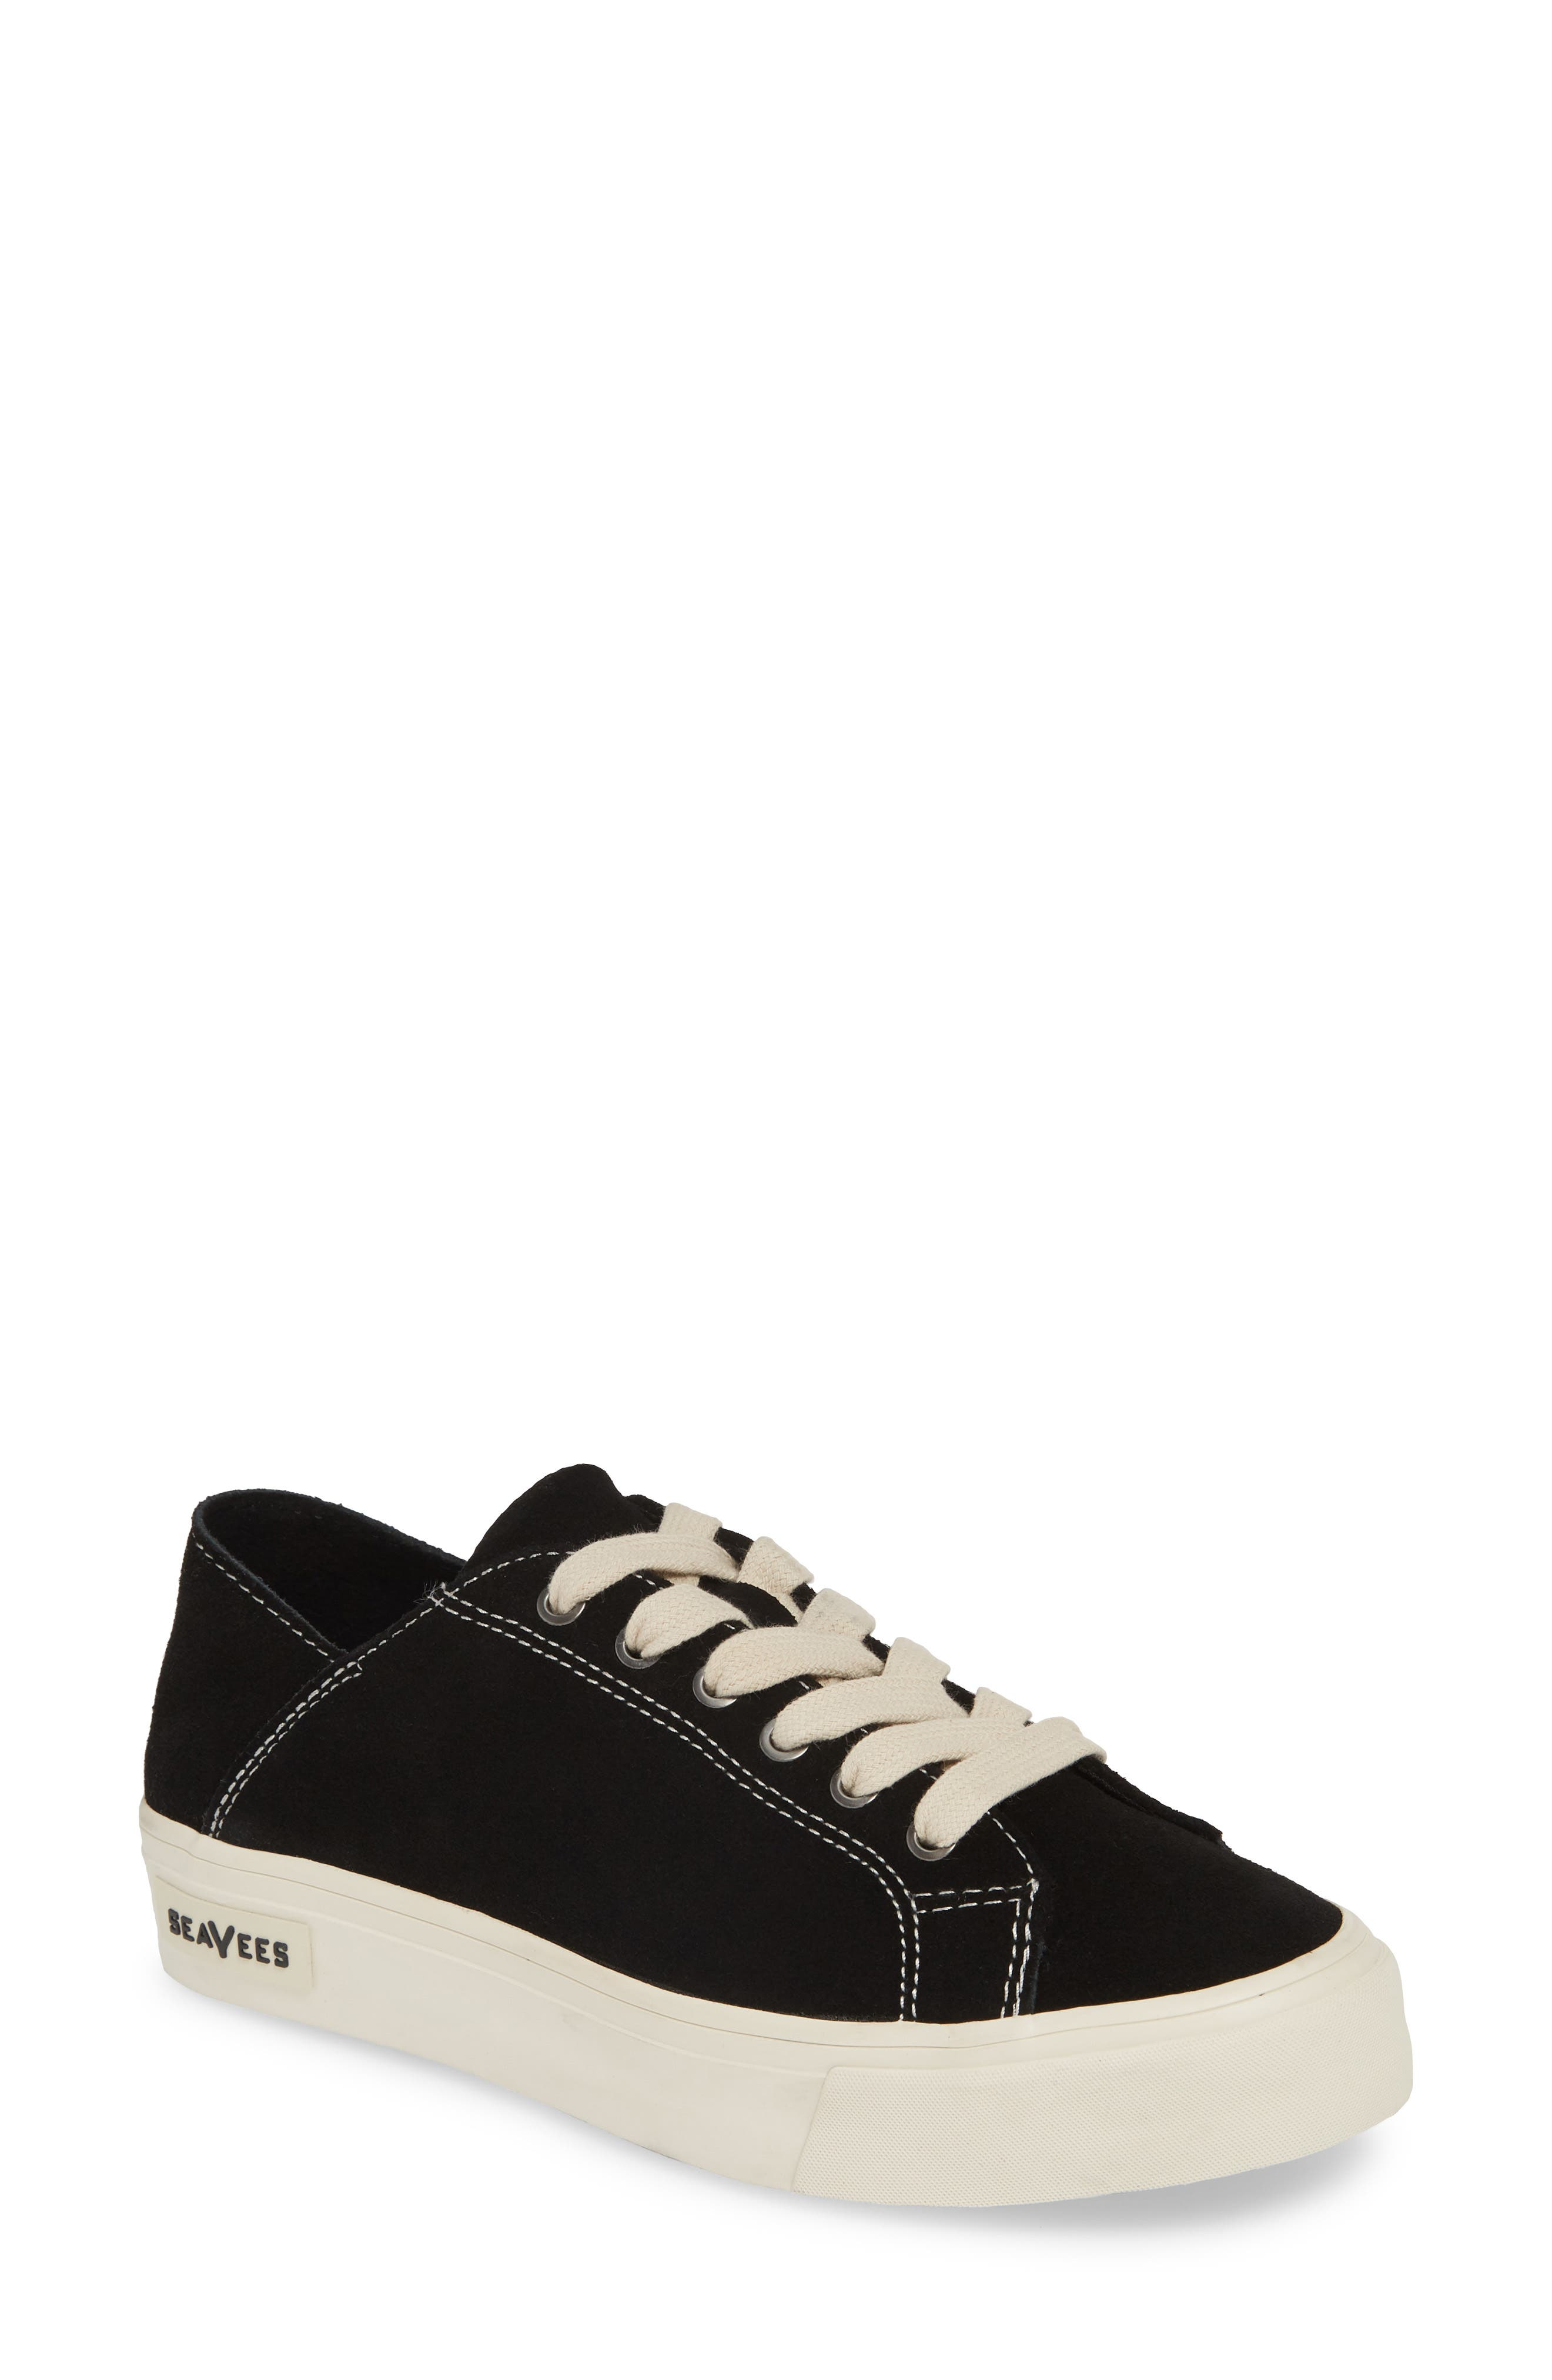 SEAVEES,                             Sausalito Sneaker,                             Main thumbnail 1, color,                             BLACK/ BLACK